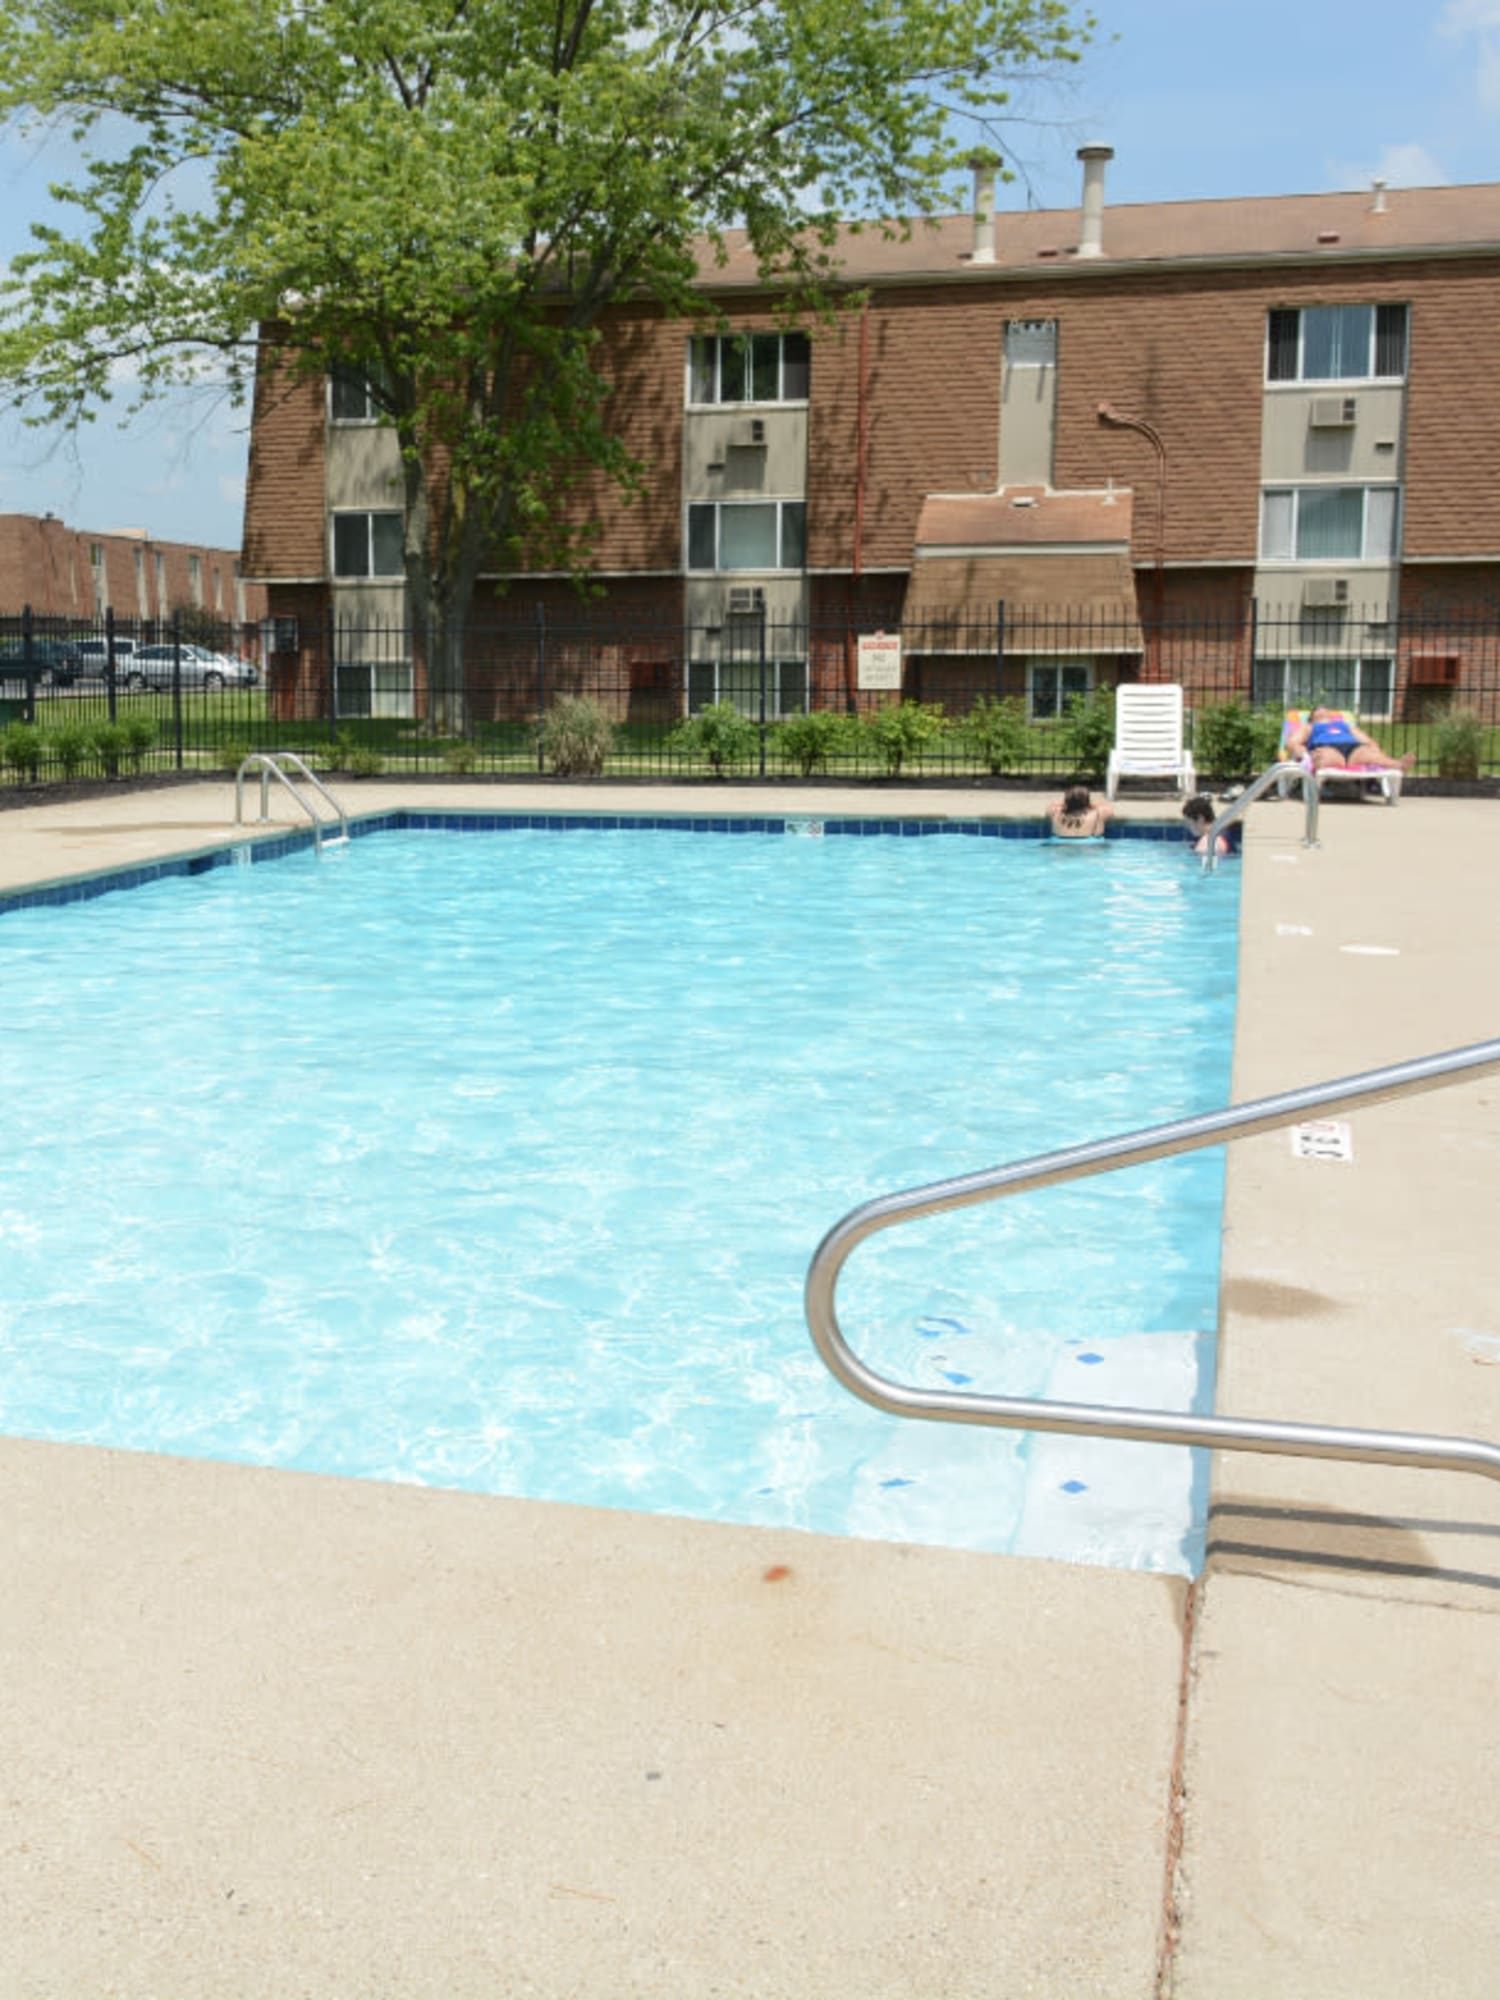 A large swimming pool at Northgate Meadows Apartments in Cincinnati, Ohio